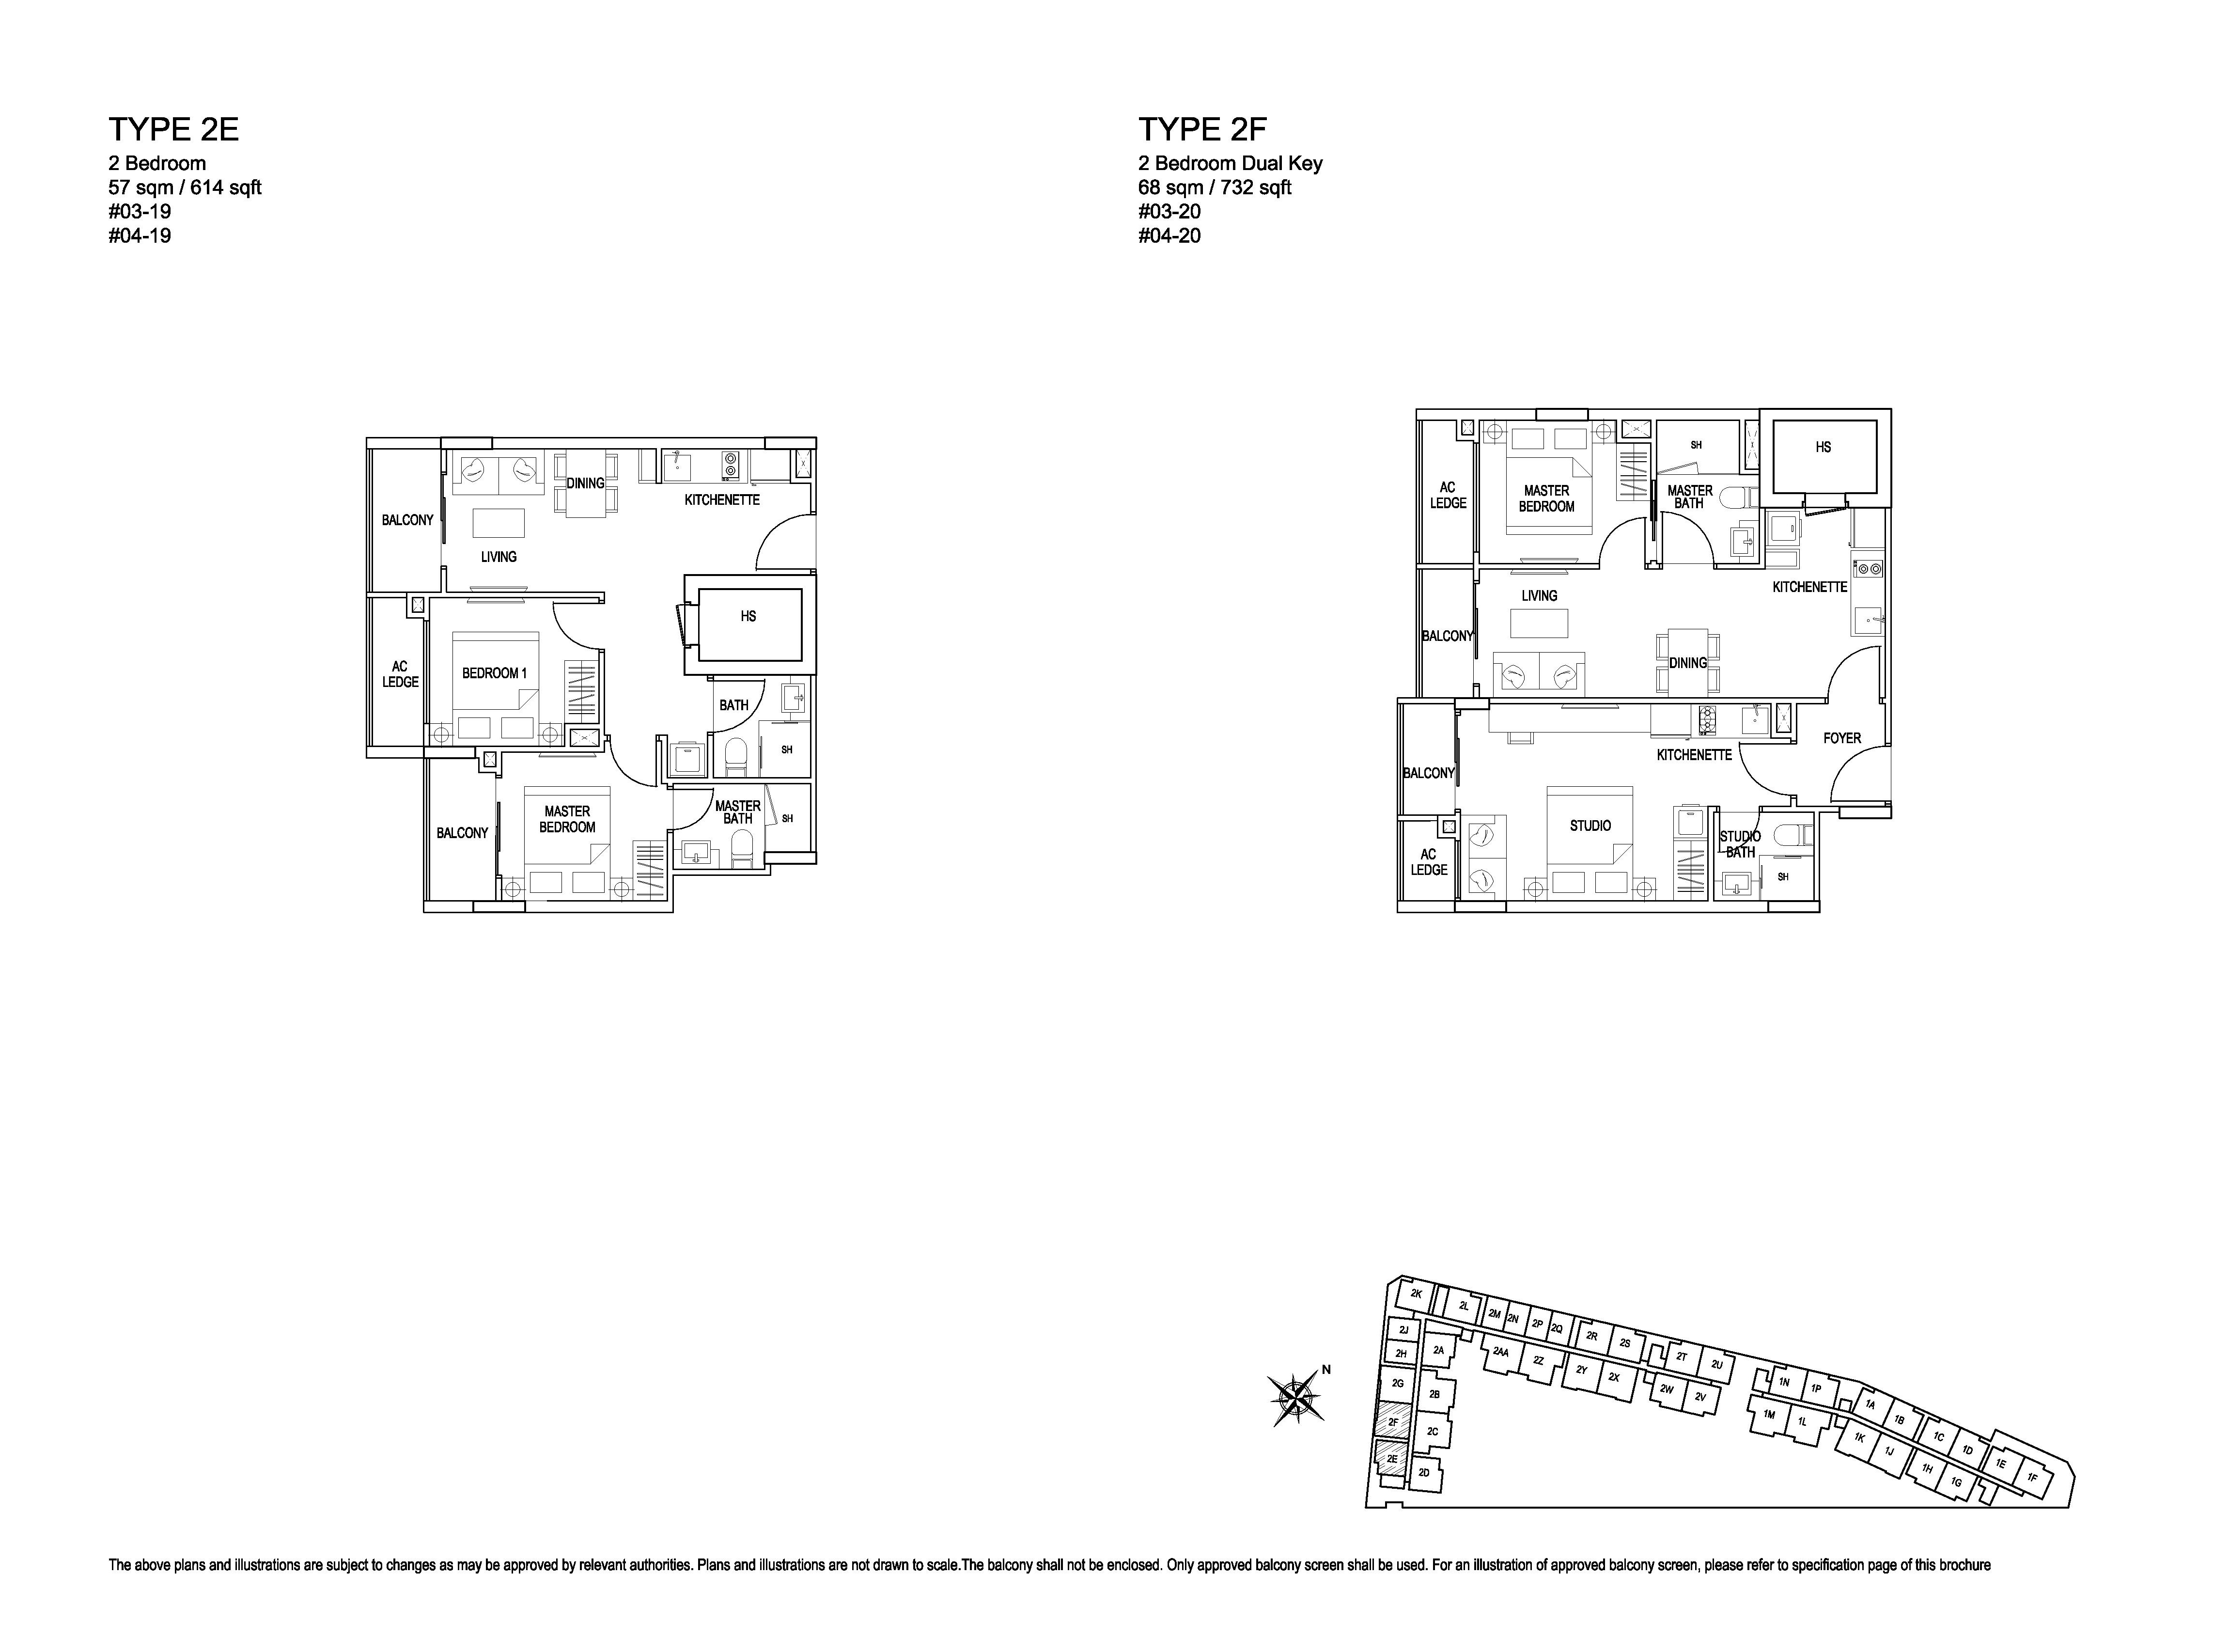 Kensington Square 2 Bedroom Dual Key Floor Plans Type 2F